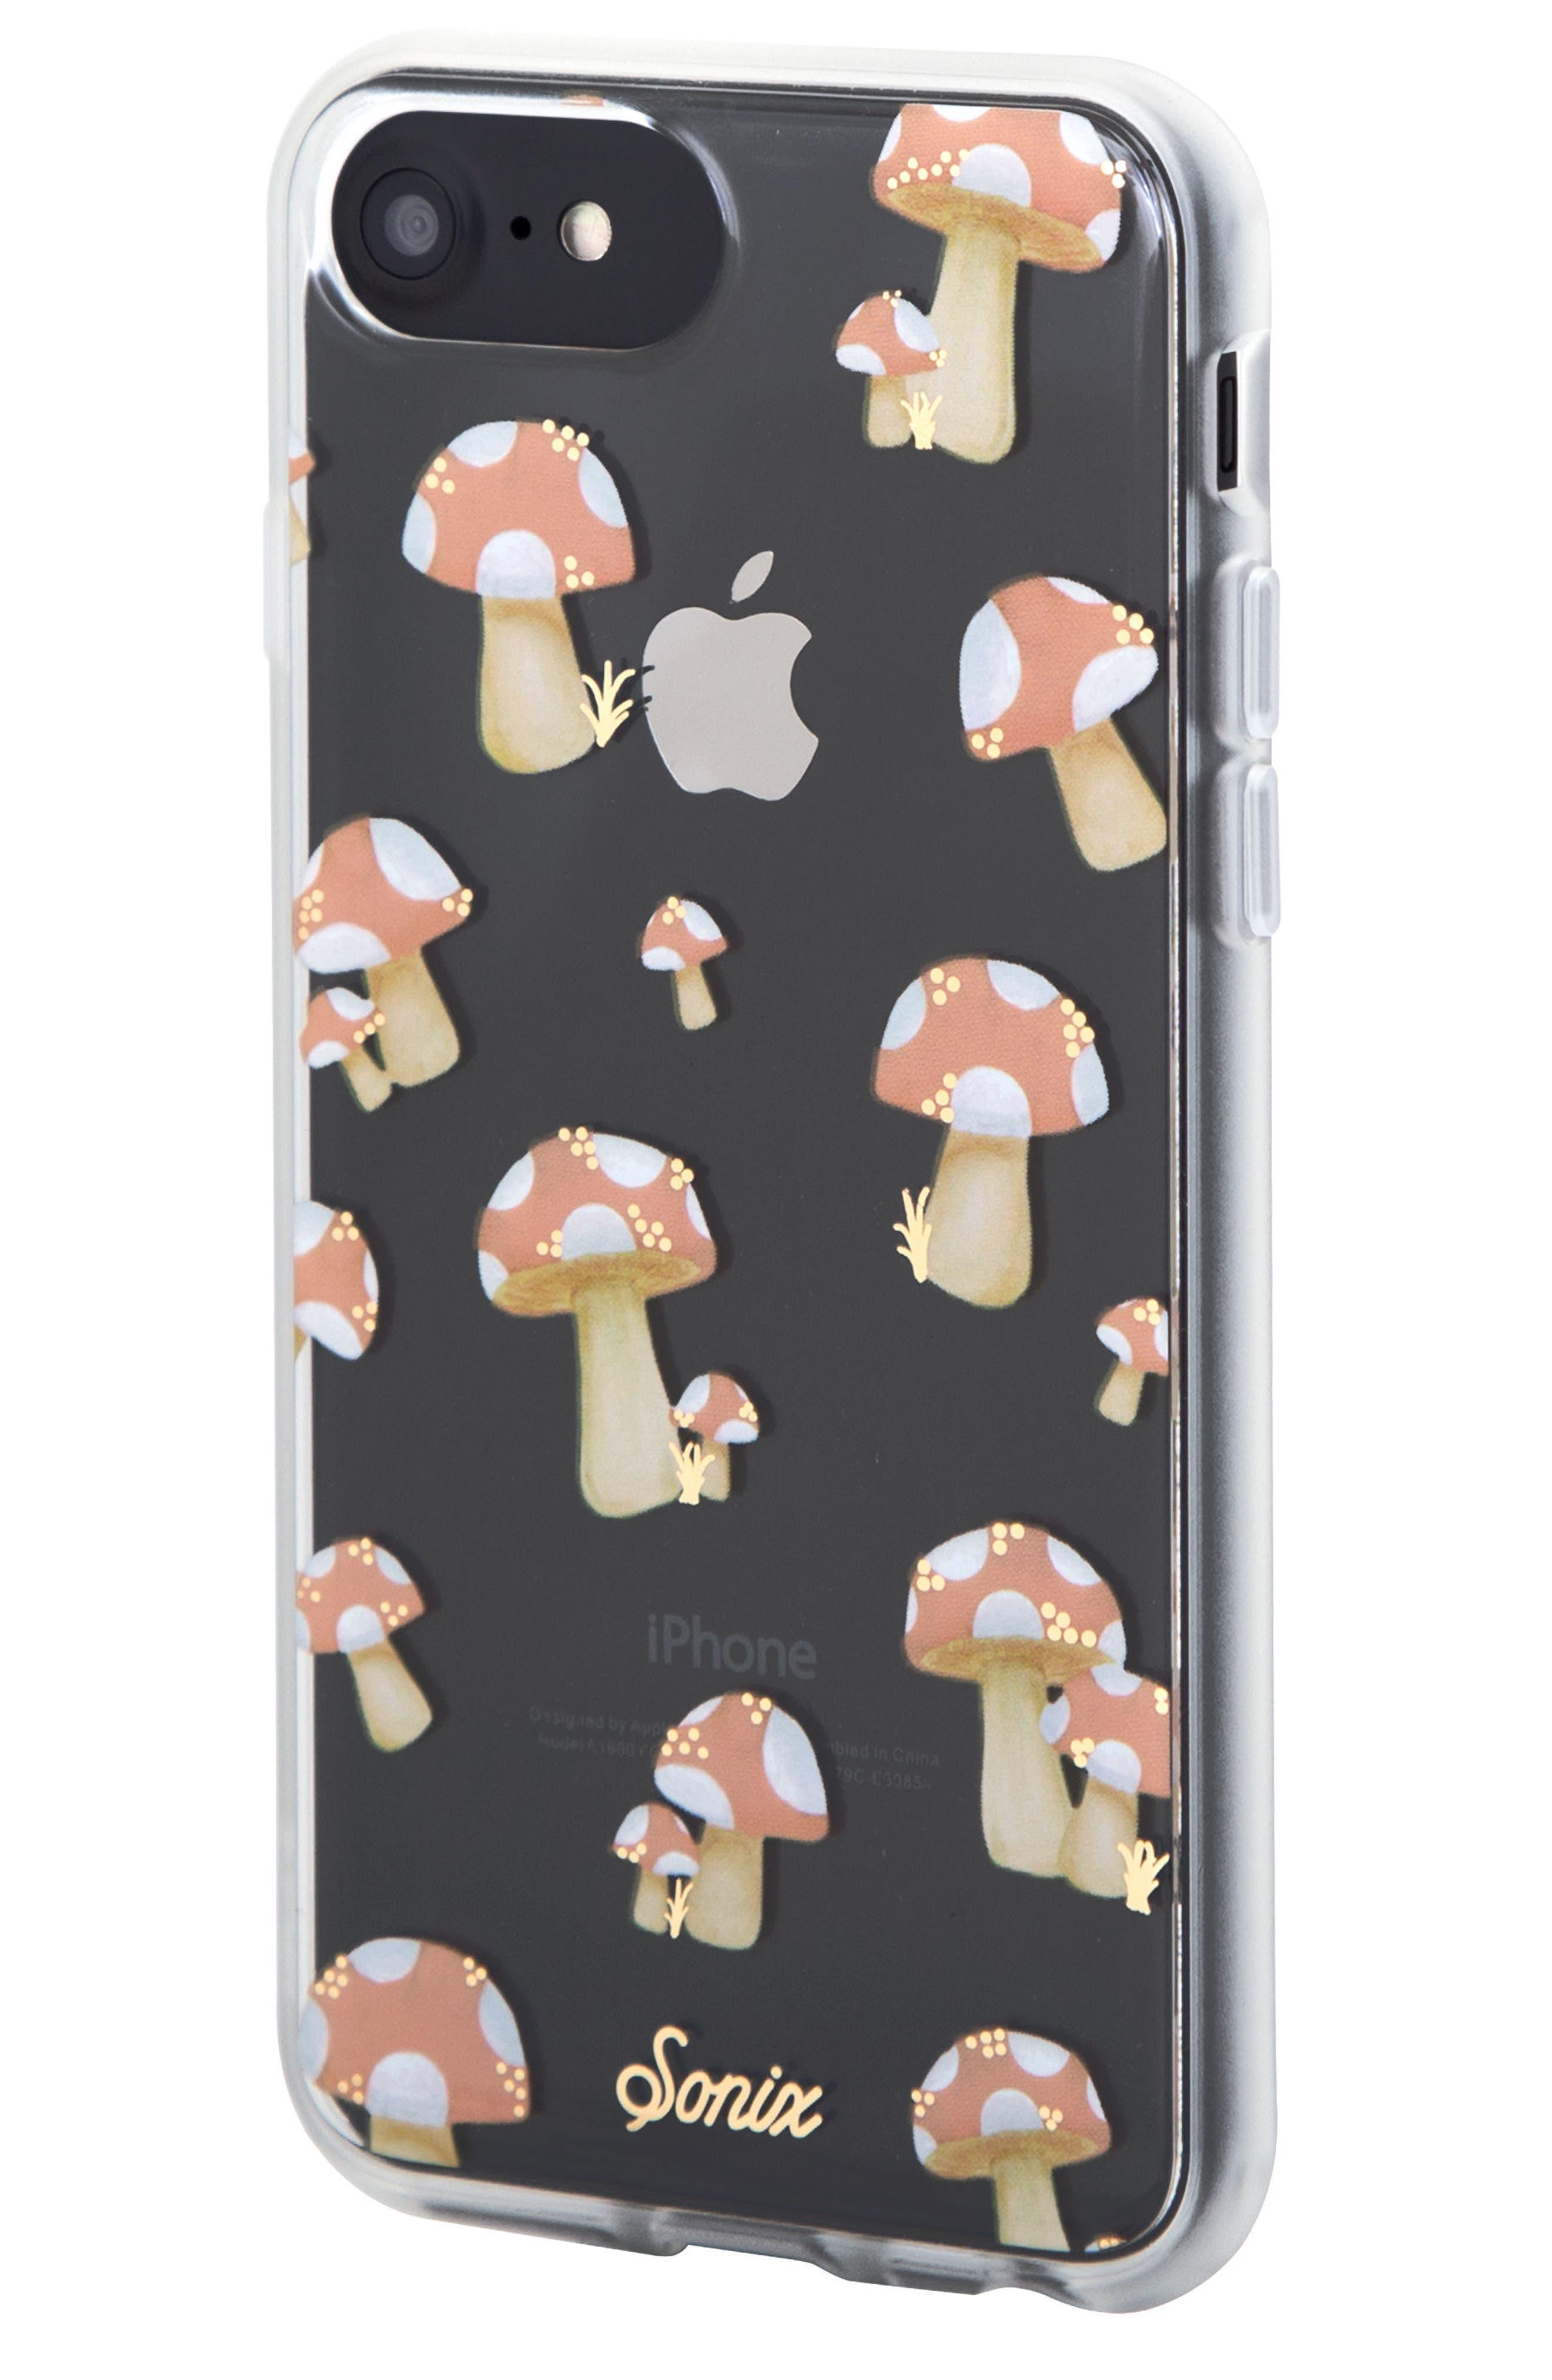 Mushroom iPhone 6/6s/7/8 & 6/6s/7/8 Plus Case,                             Alternate thumbnail 2, color,                             Peach/ Tan